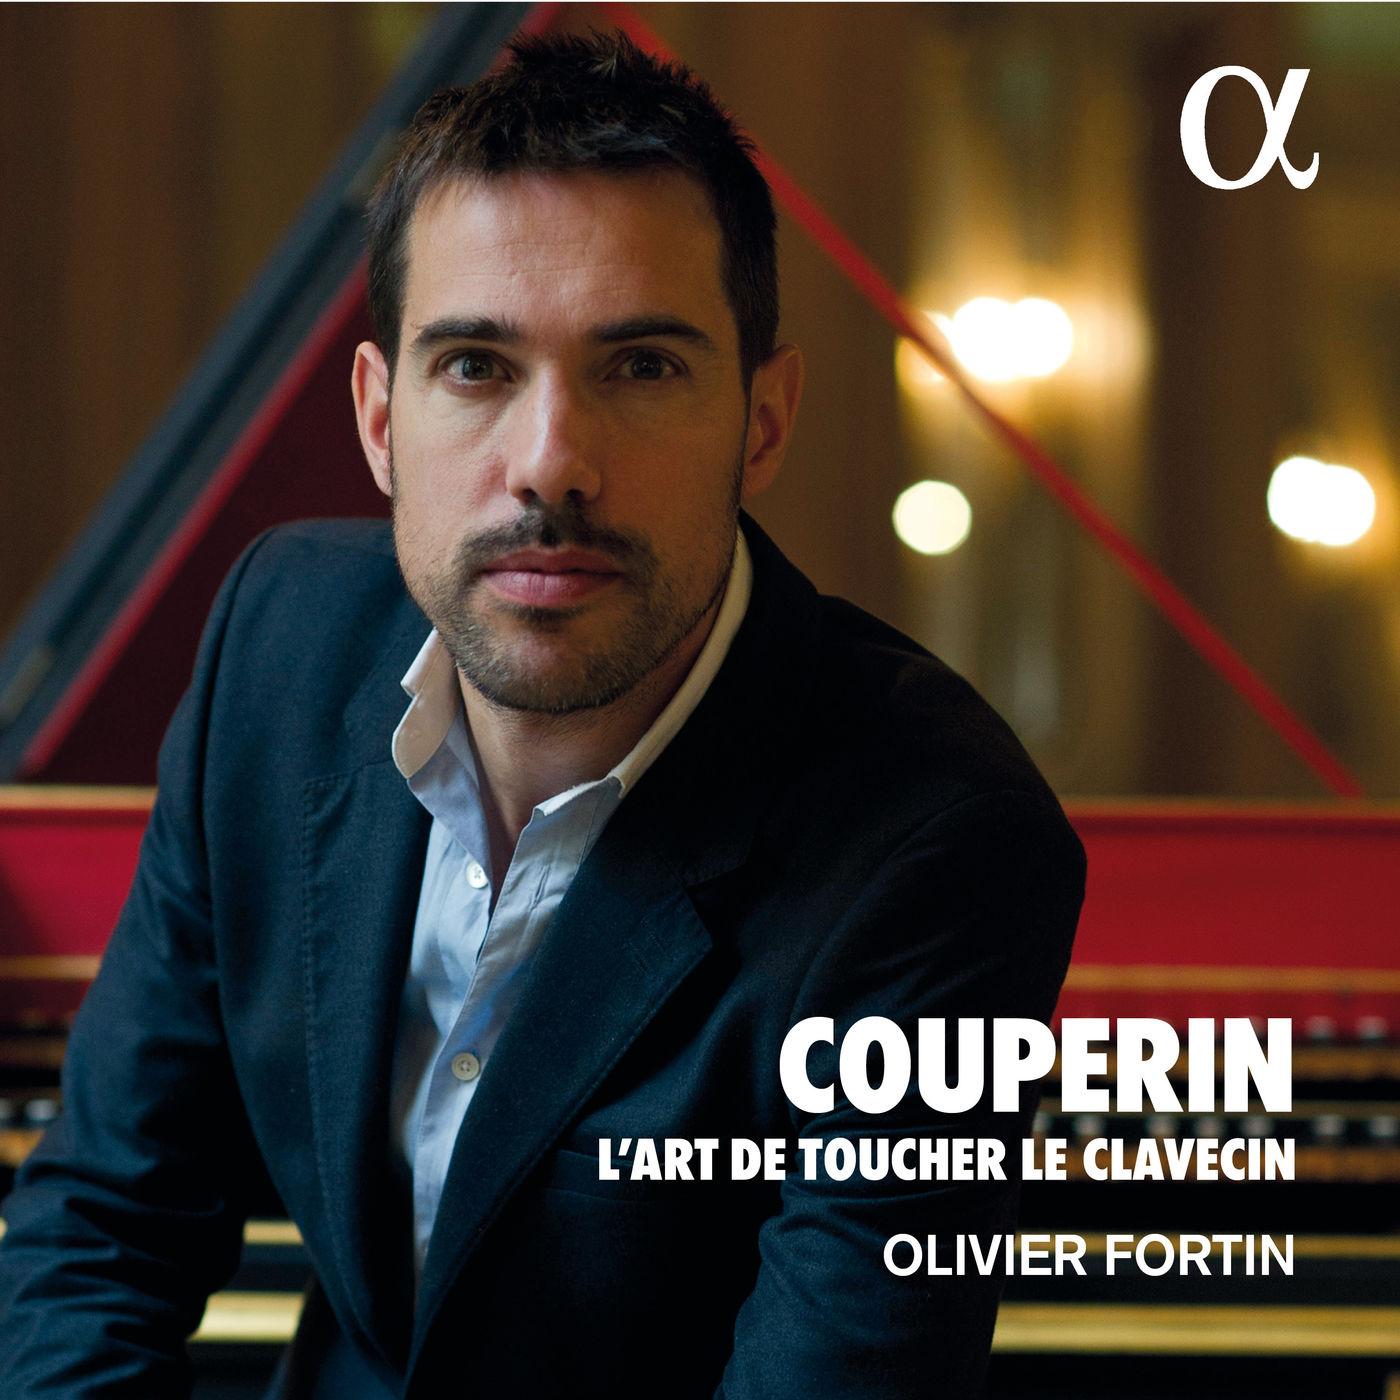 Music is the key: Olivier Fortin FRANÇOIS COUPERIN L'Art de